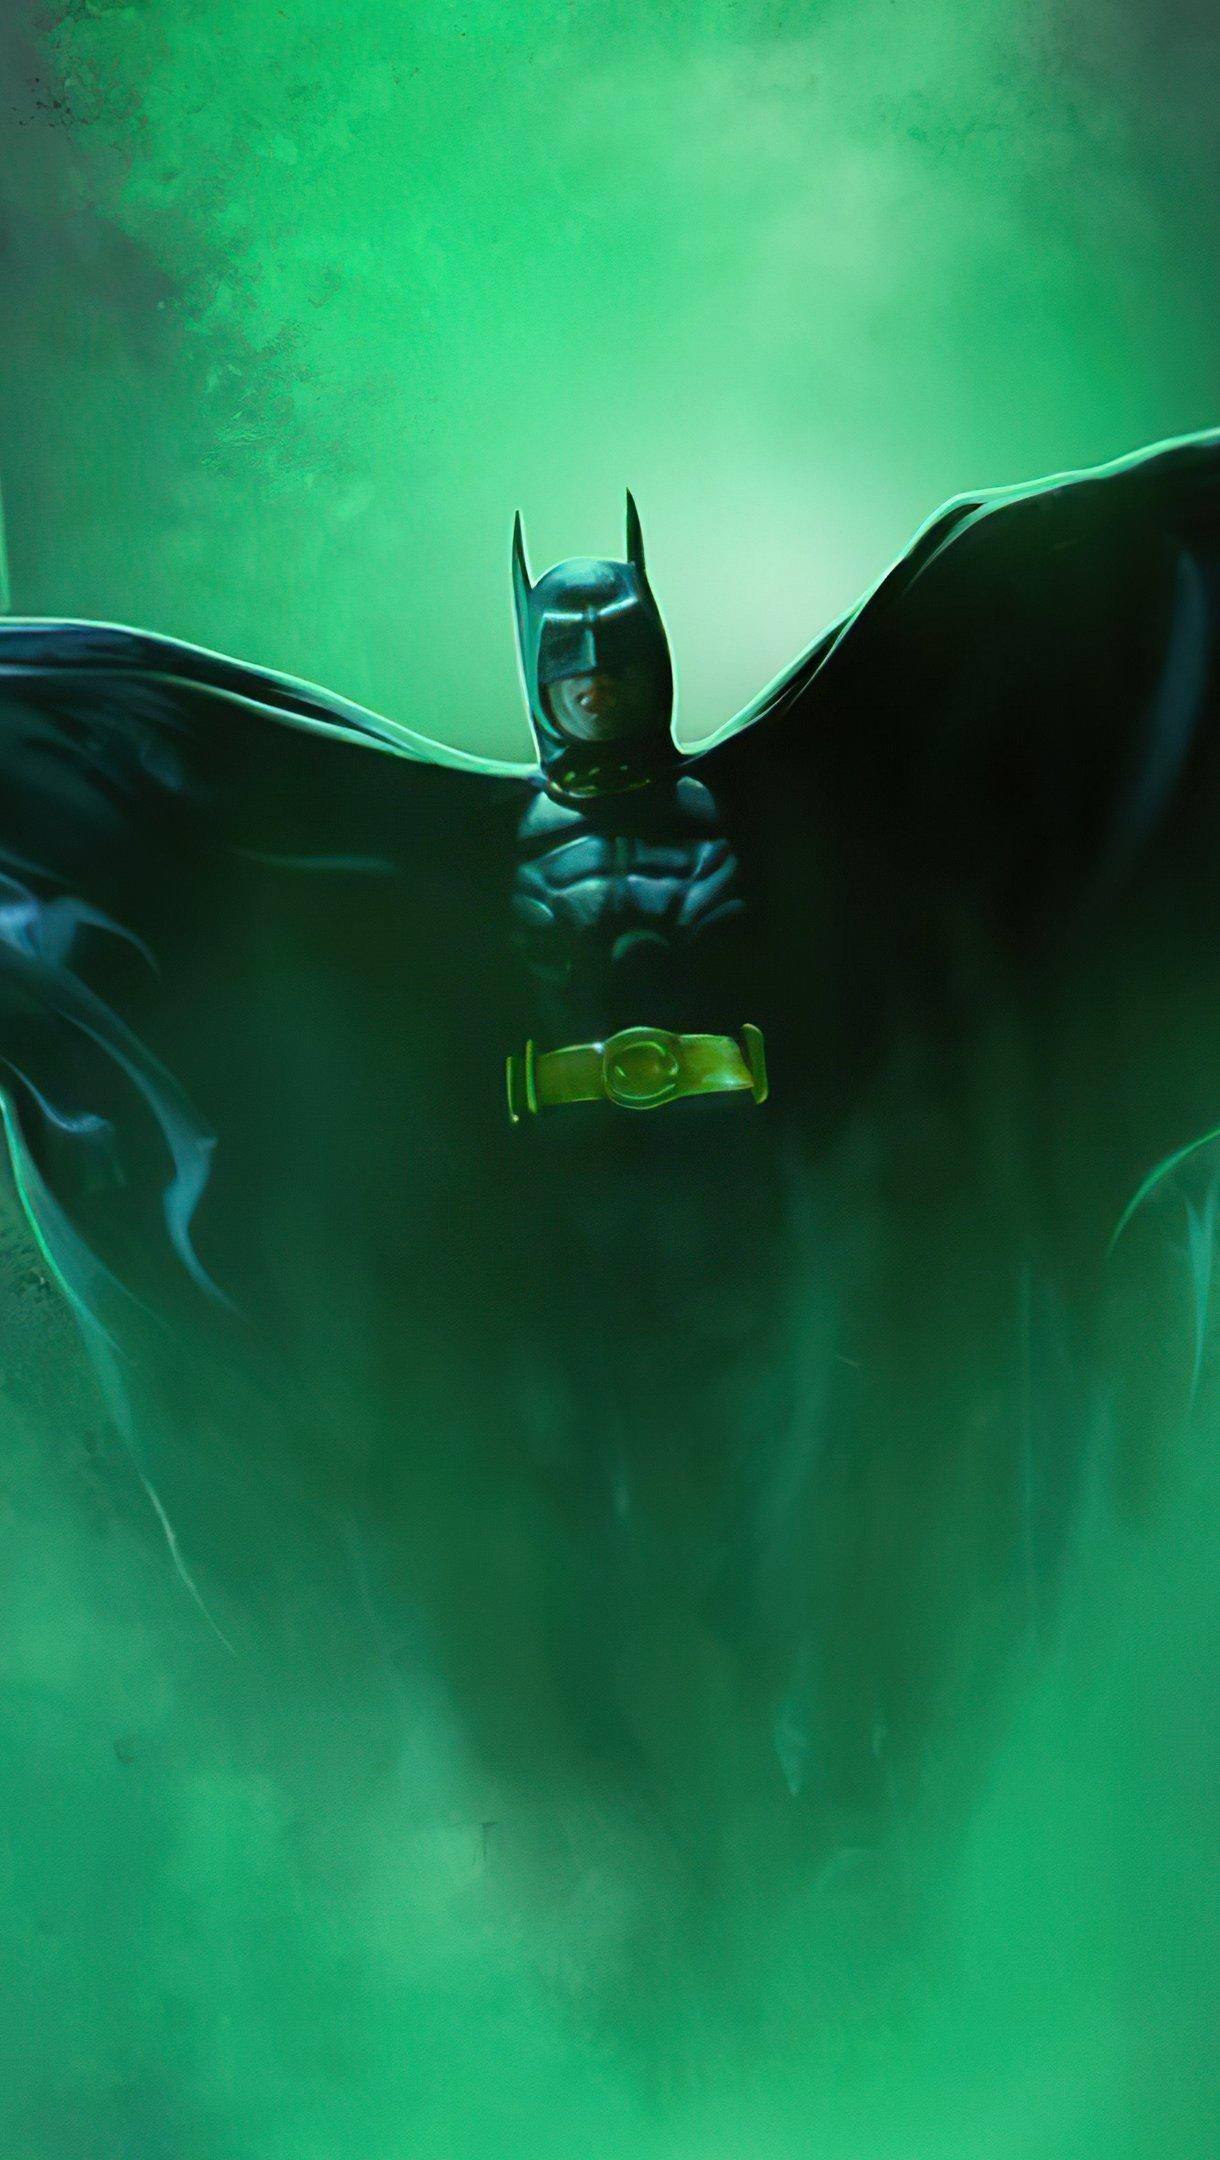 Wallpaper Michael Keaton as Batman Fanart Vertical